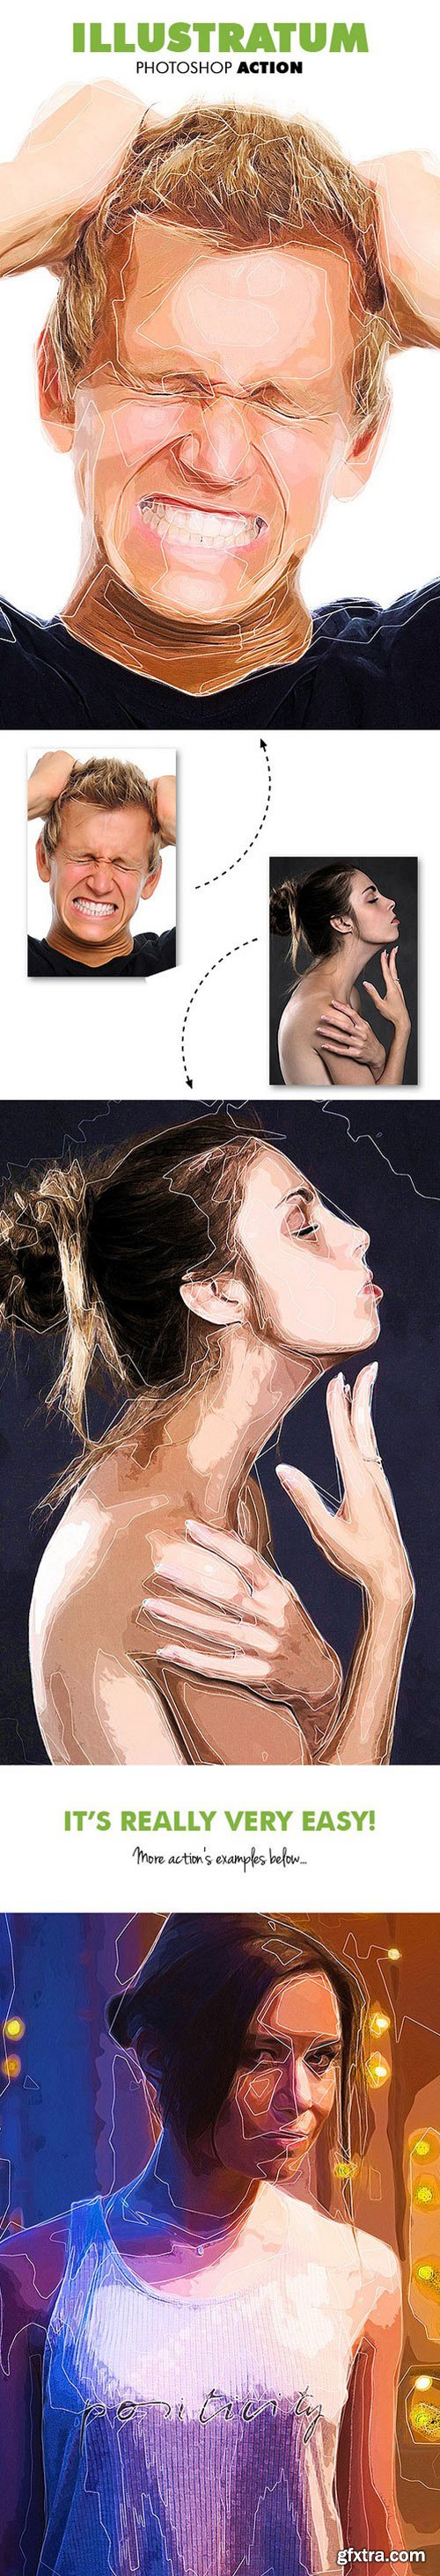 Graphicriver - Illustratum Photoshop Action 19718166